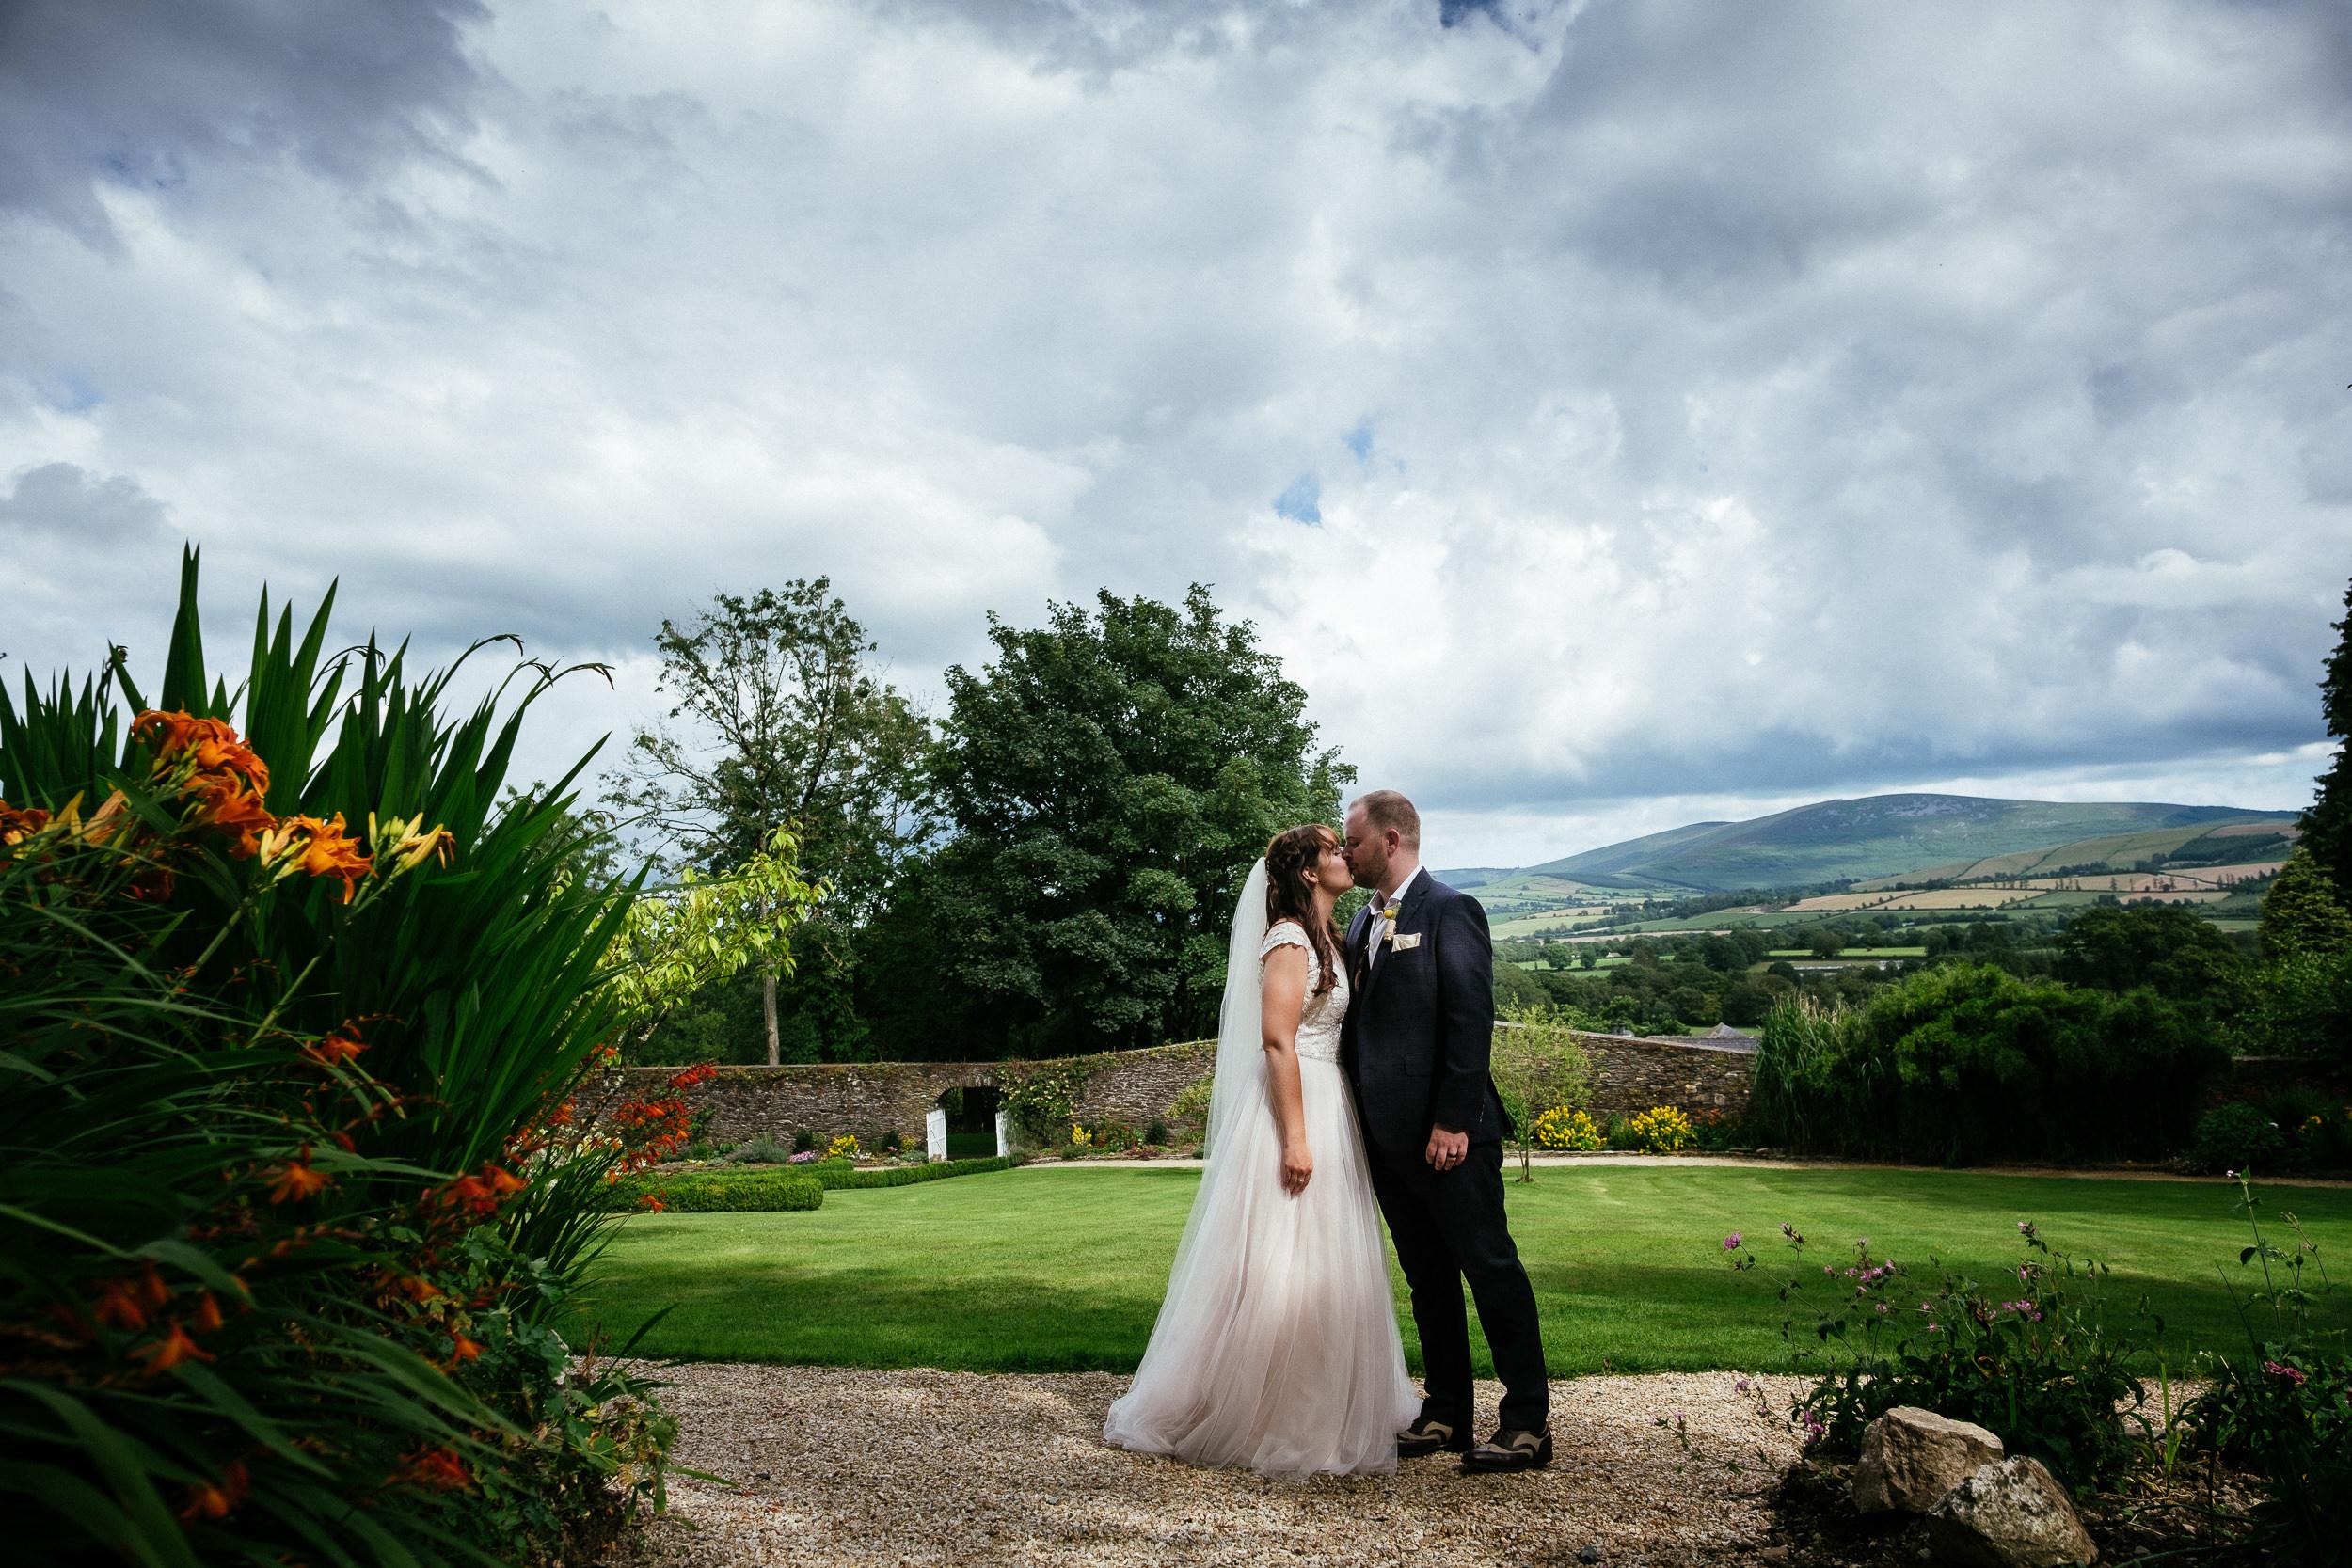 bride and groom walking in walled garden of ballybeg house